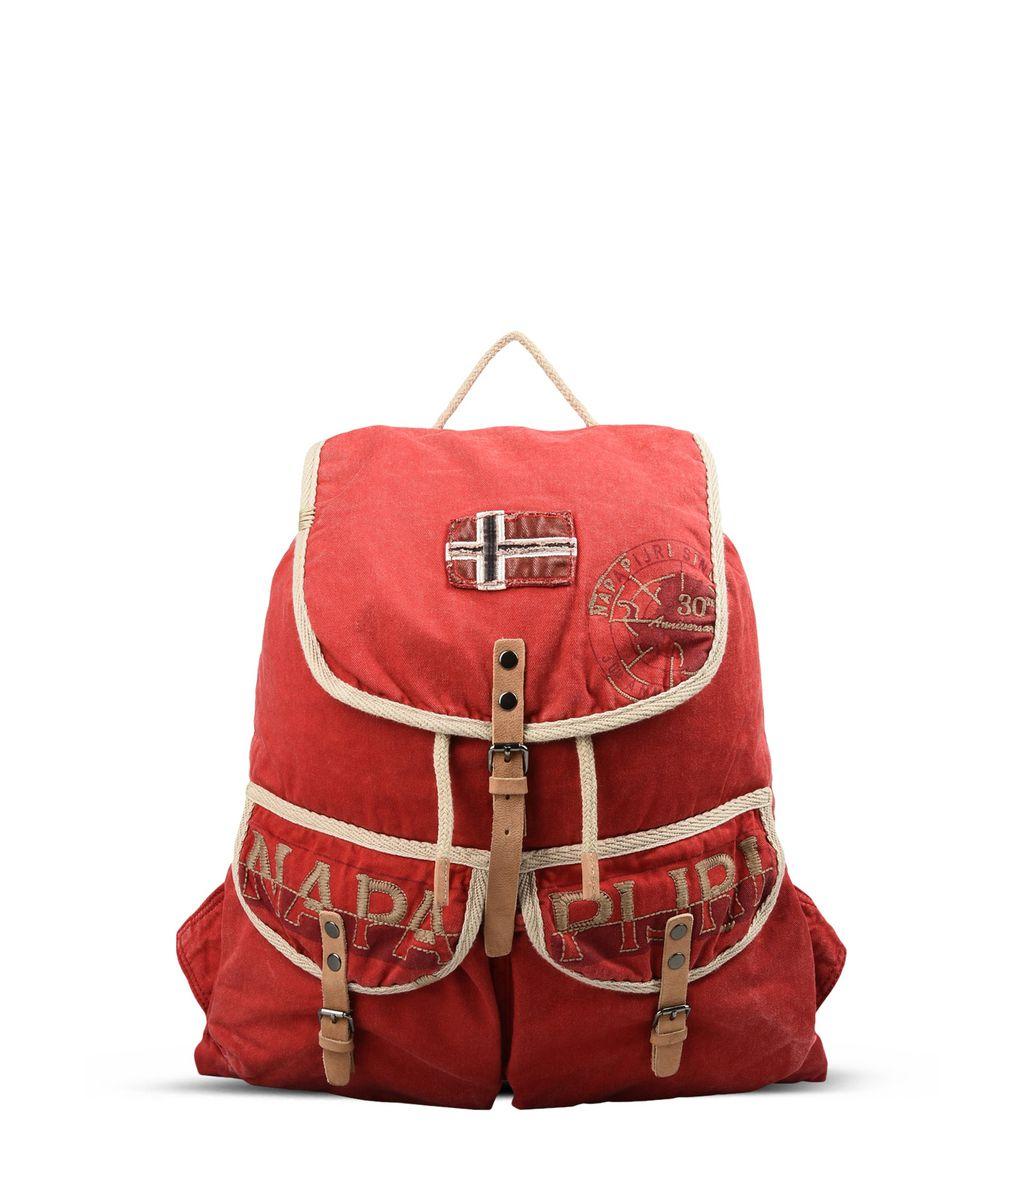 sac de voyage napapijri femme